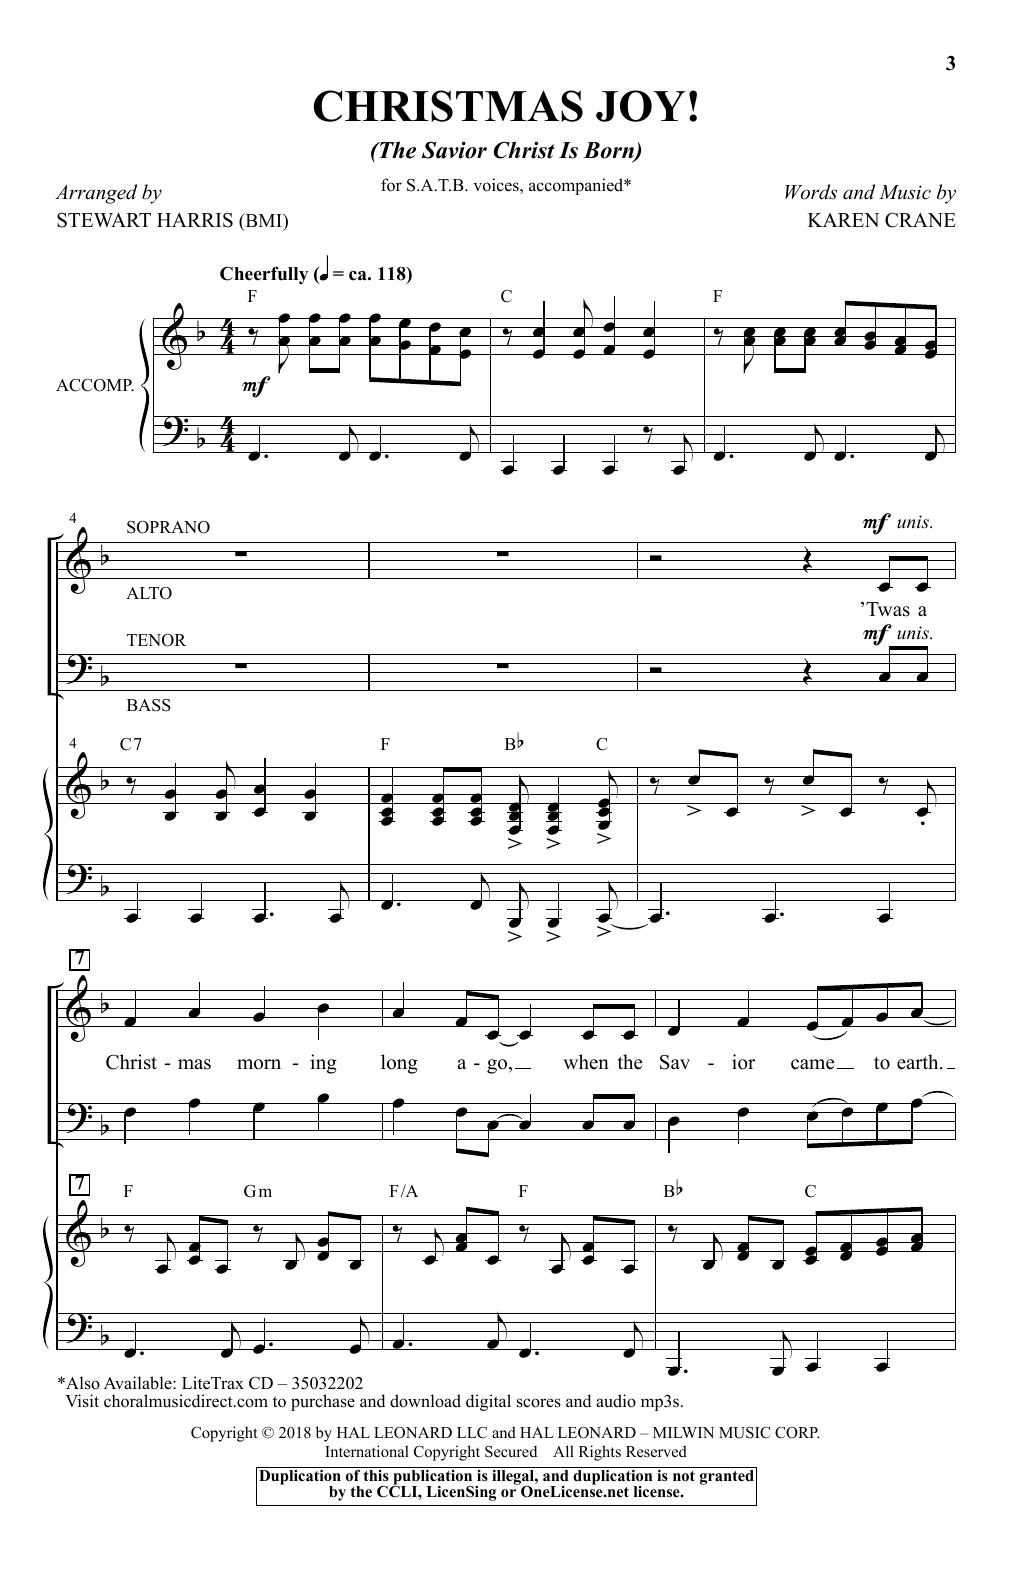 Christmas Joy! (The Savior Christ Is Born) (arr. Stewart Harris) (SATB Choir)